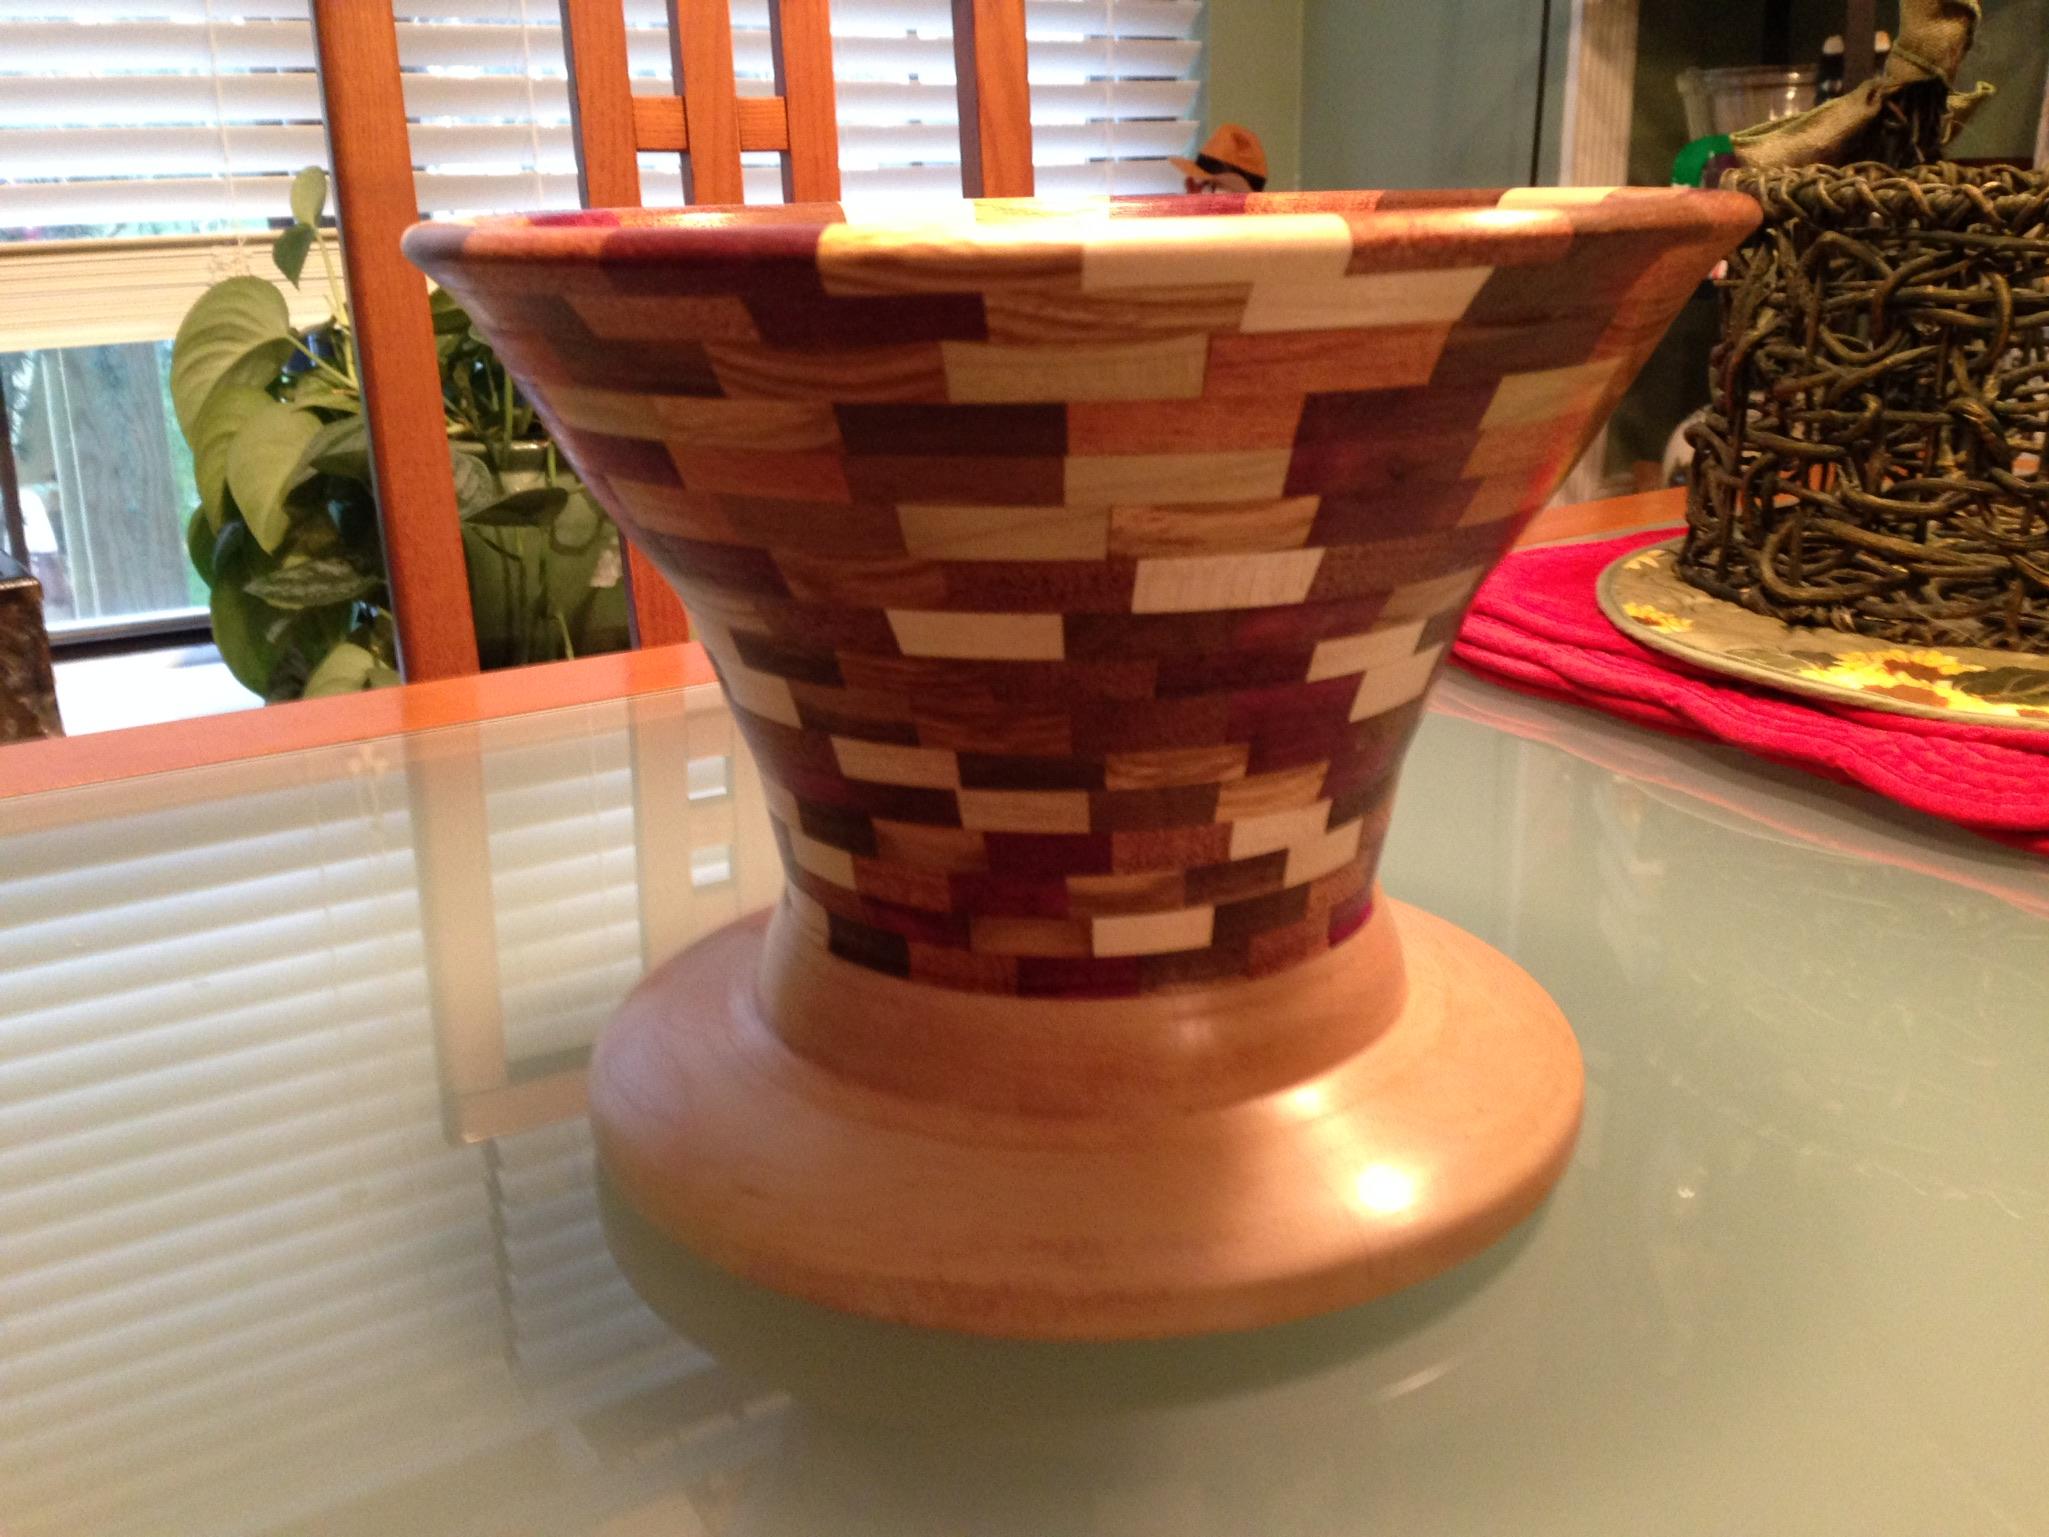 RJC Wood Creations - Bowls (61).jpg